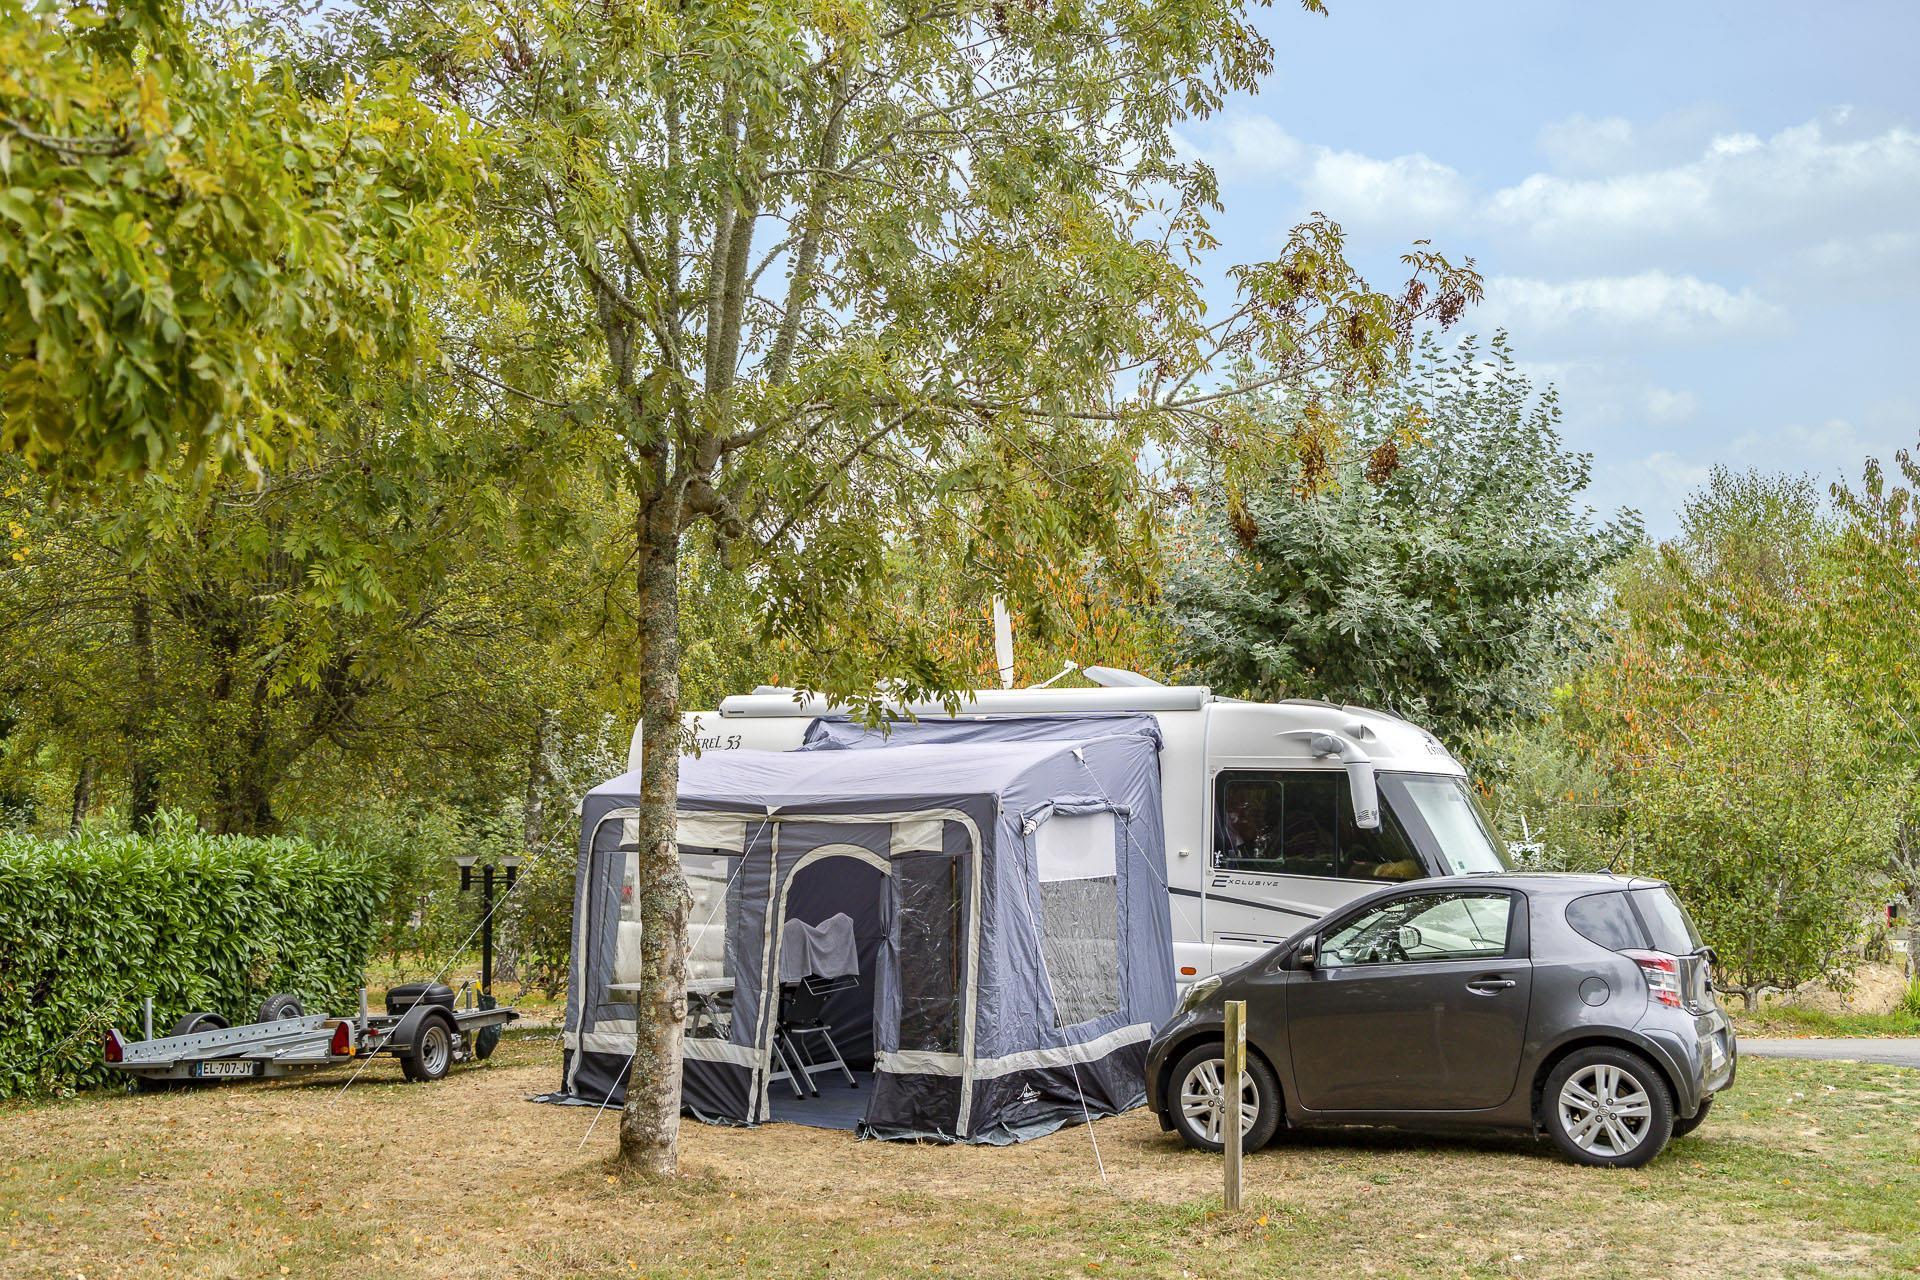 Emplacement - Emplacement *** - Camping Sandaya Les Deux Fontaines